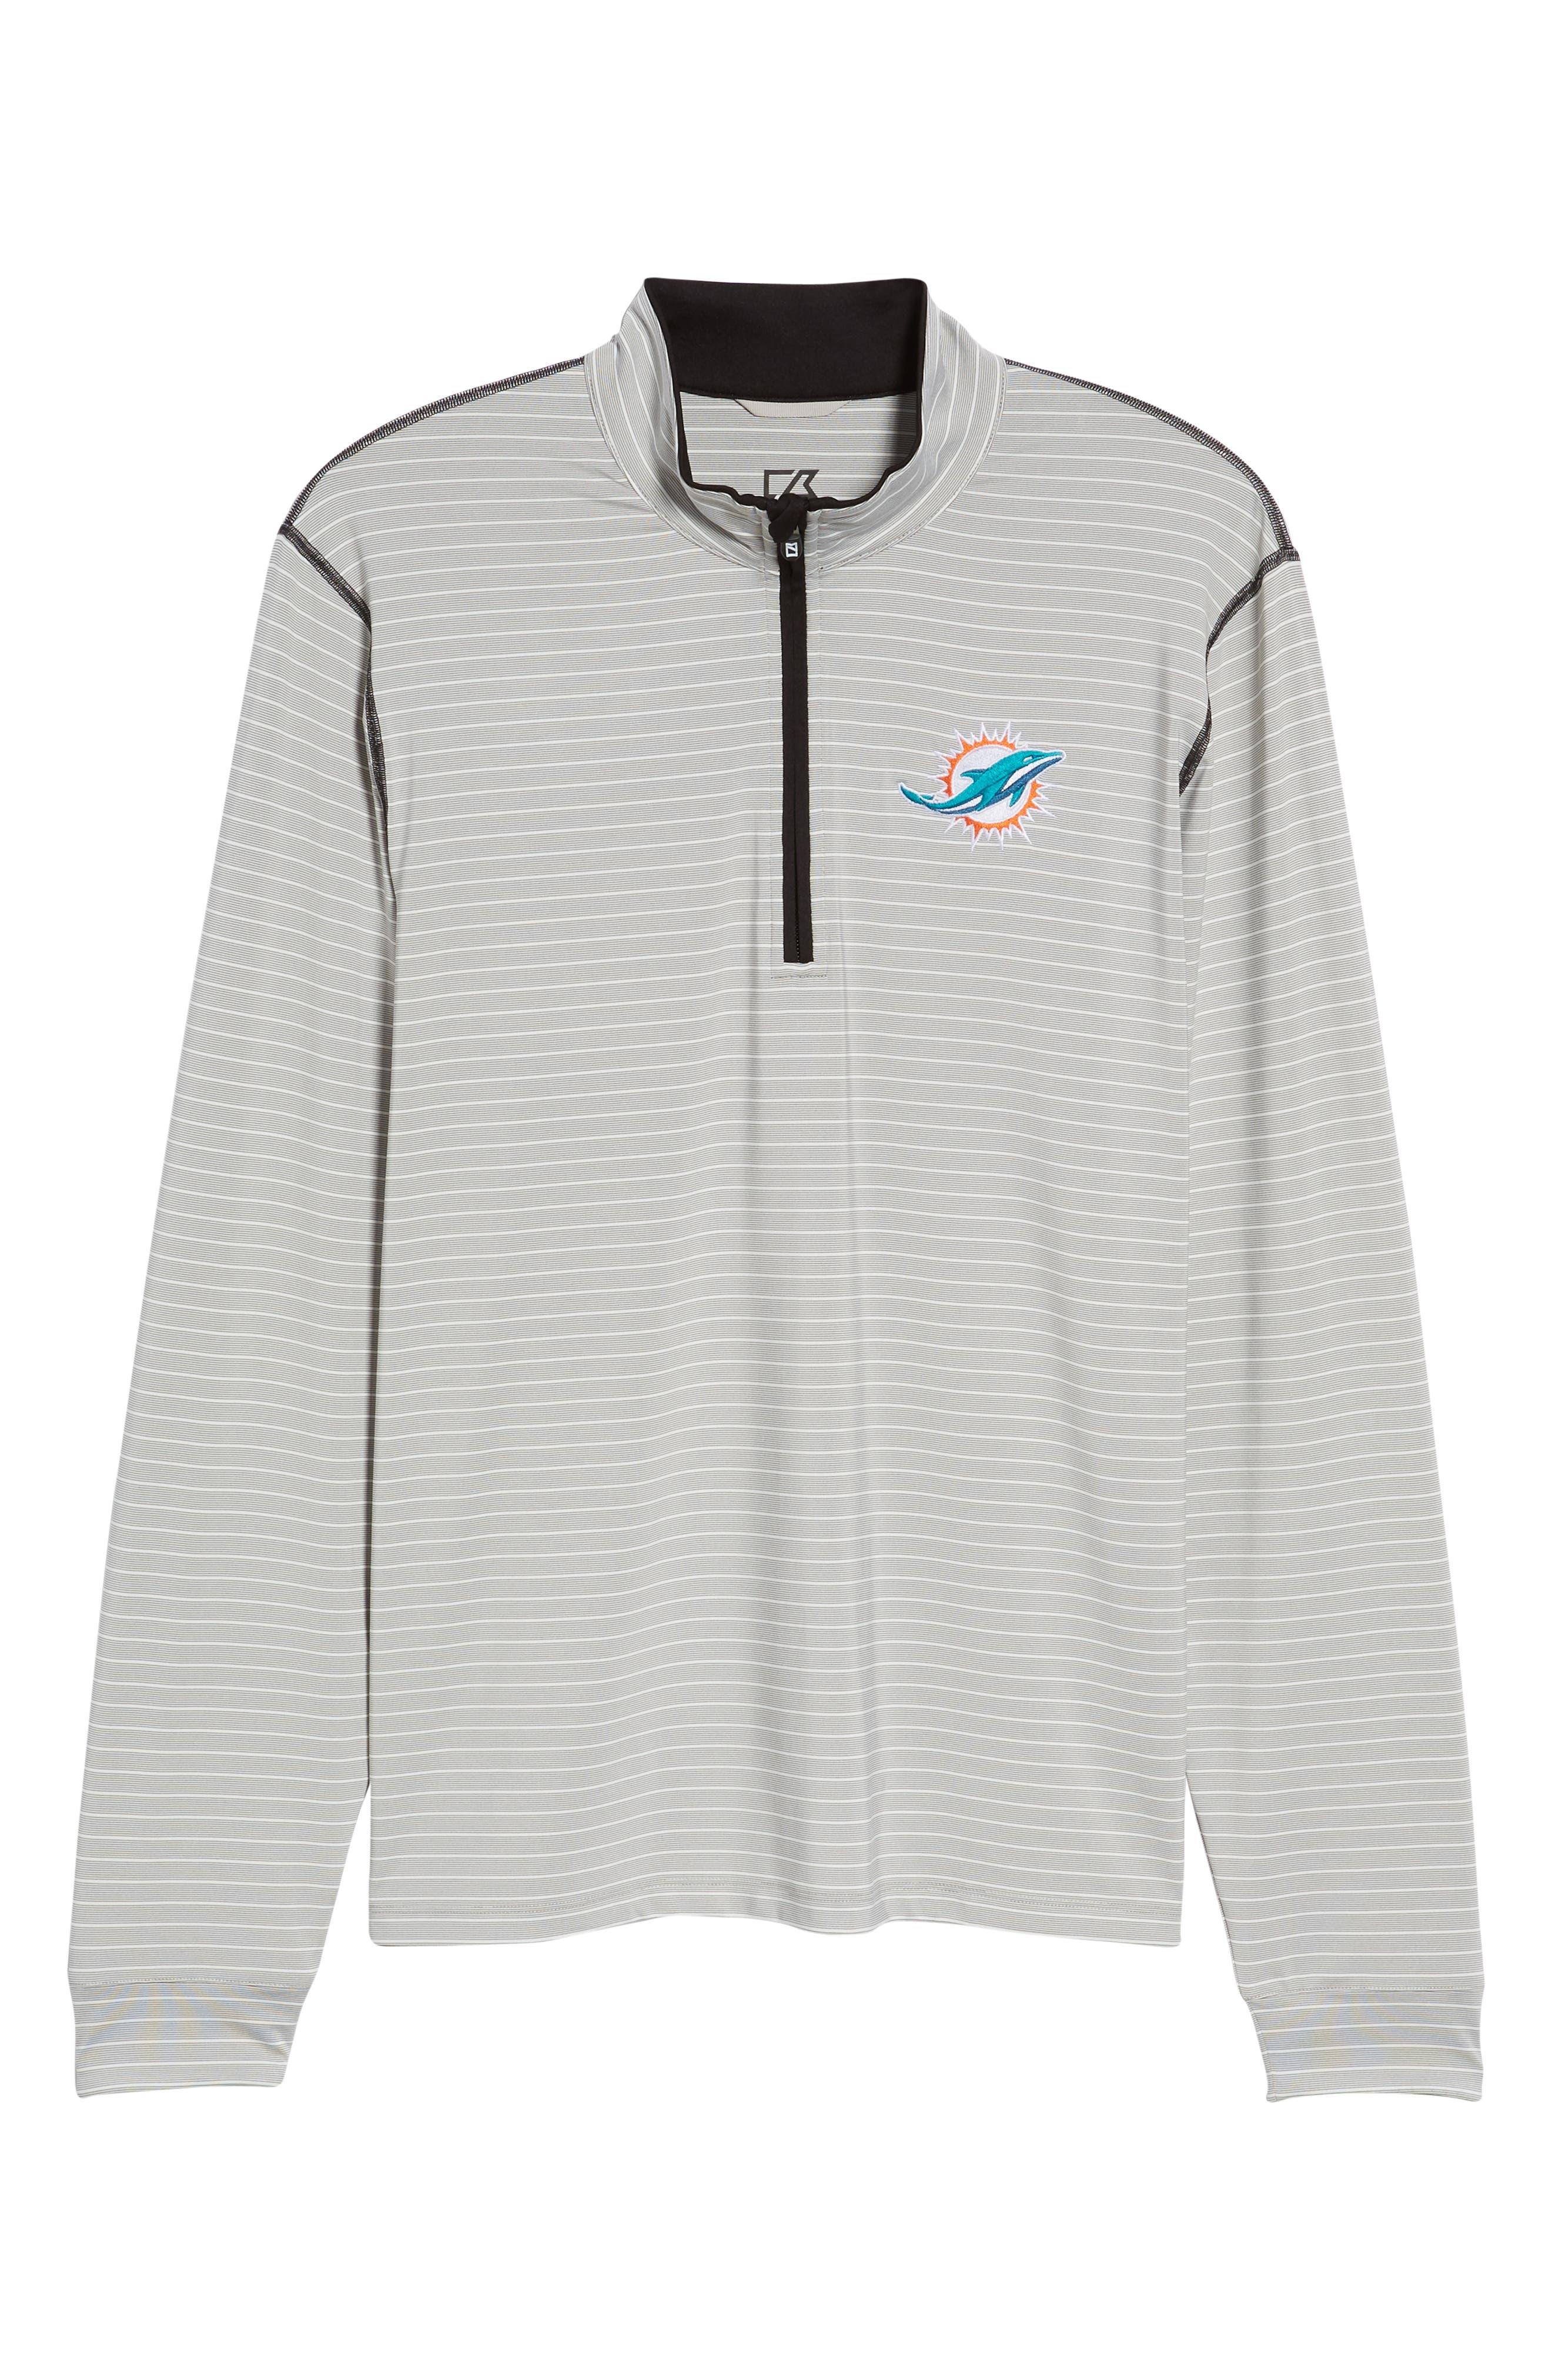 Meridian - Miami Dolphins Regular Fit Half Zip Pullover,                             Alternate thumbnail 6, color,                             BLACK